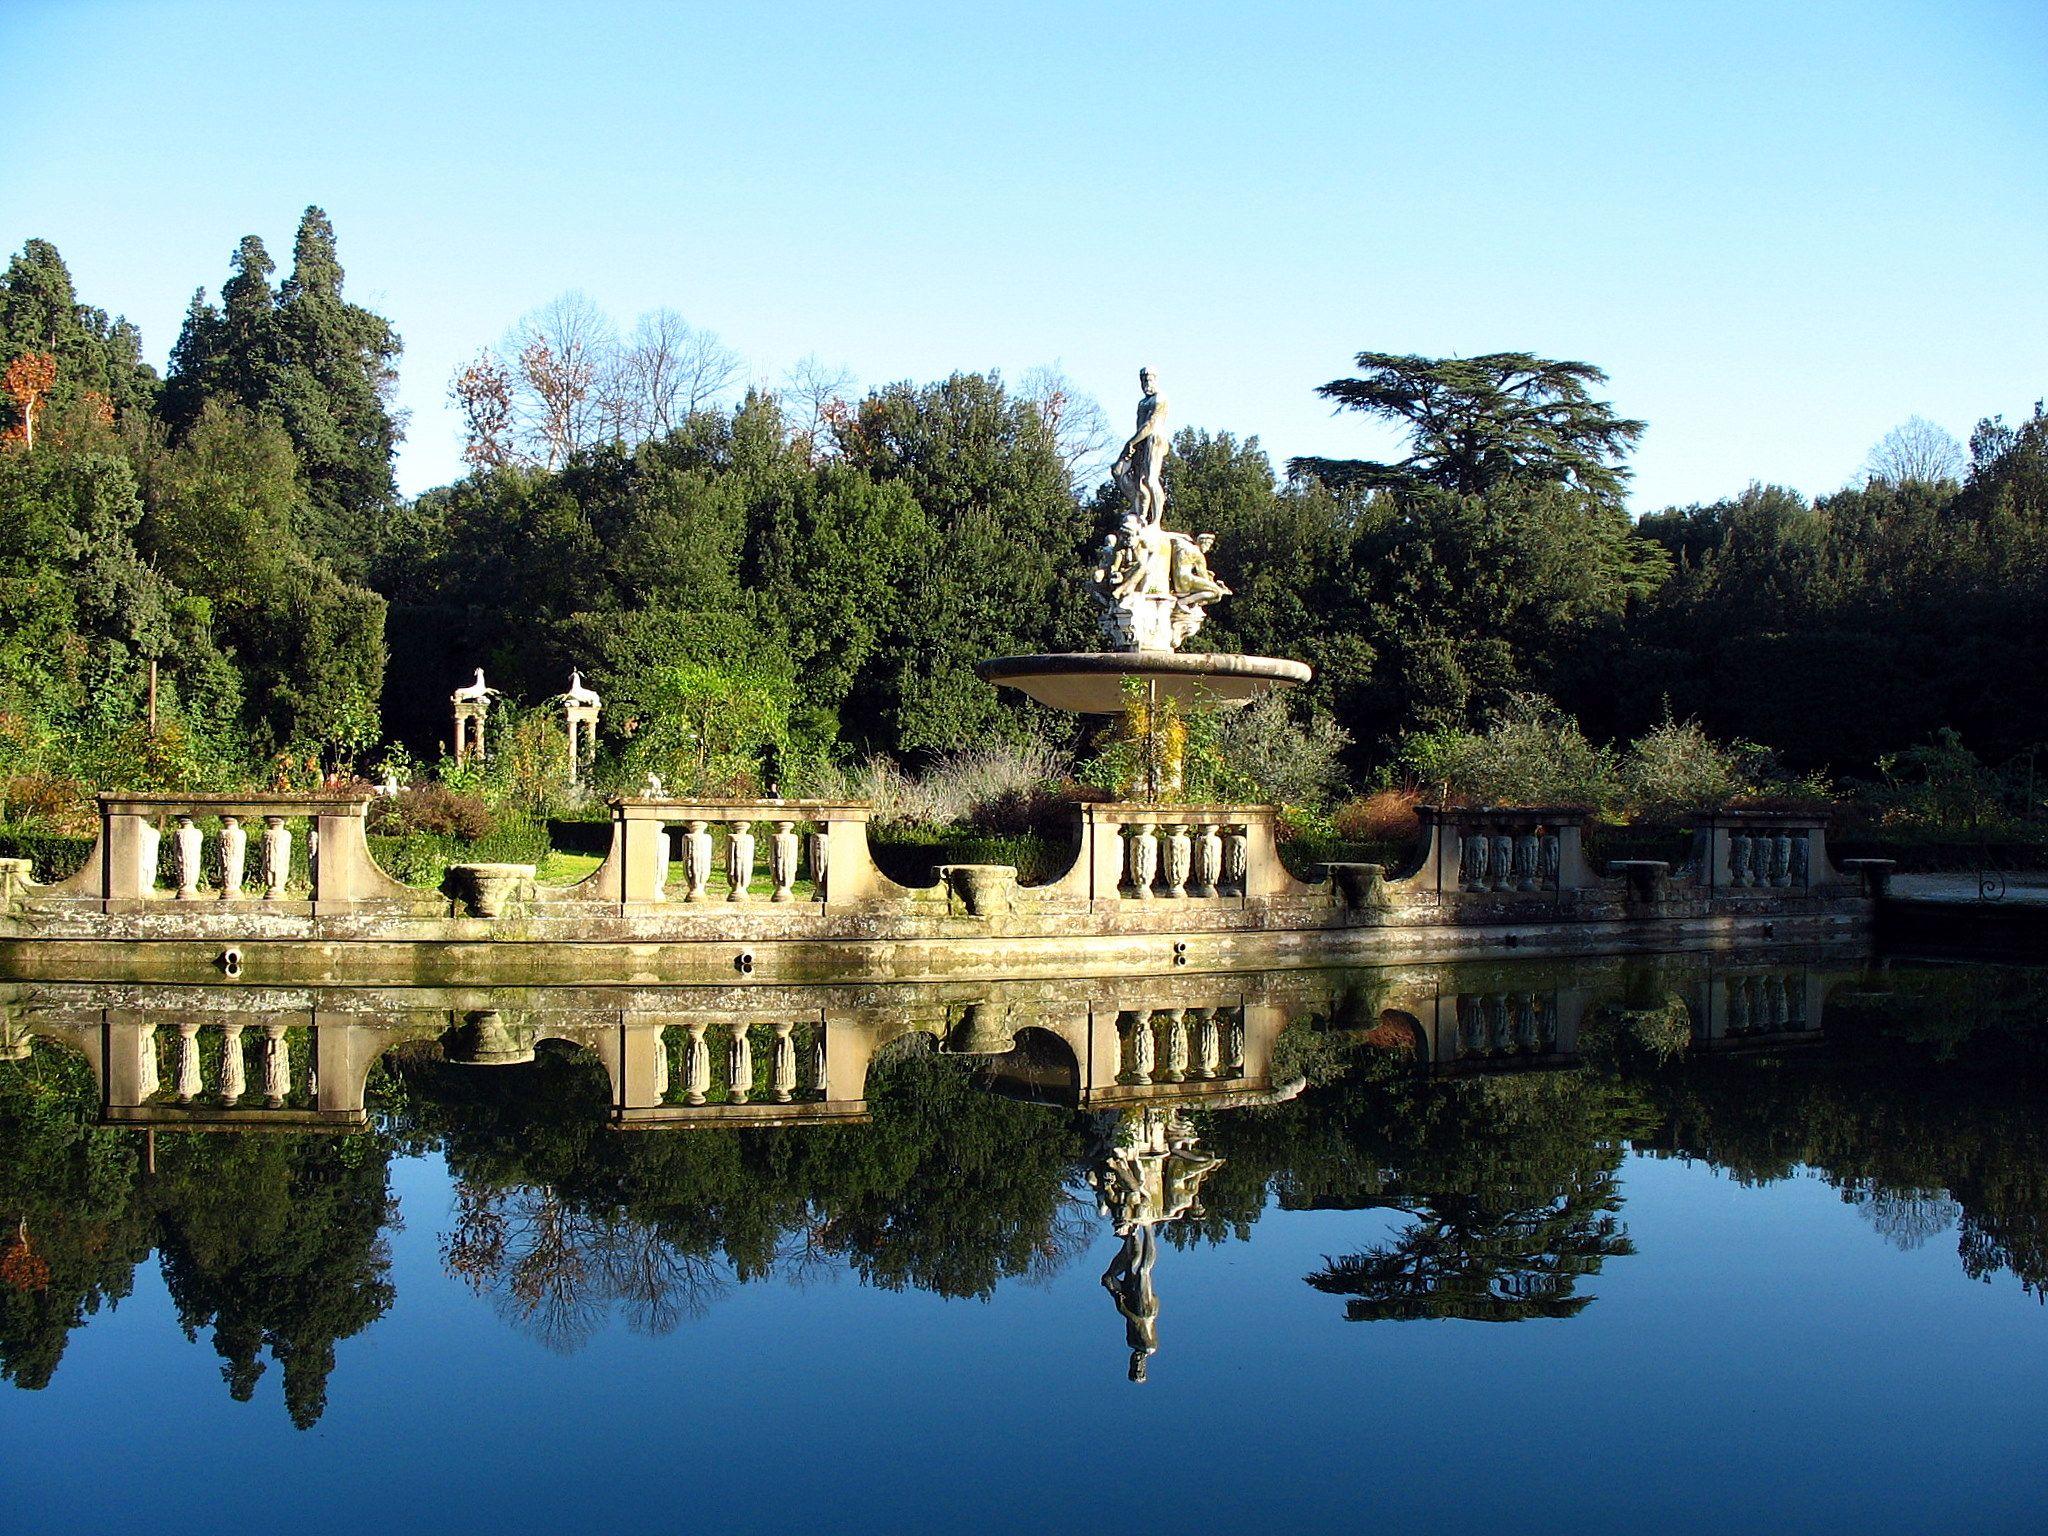 Giardino di boboli firenze boboli gardens florence italia bucket list florence house - Giardino di boboli firenze ...